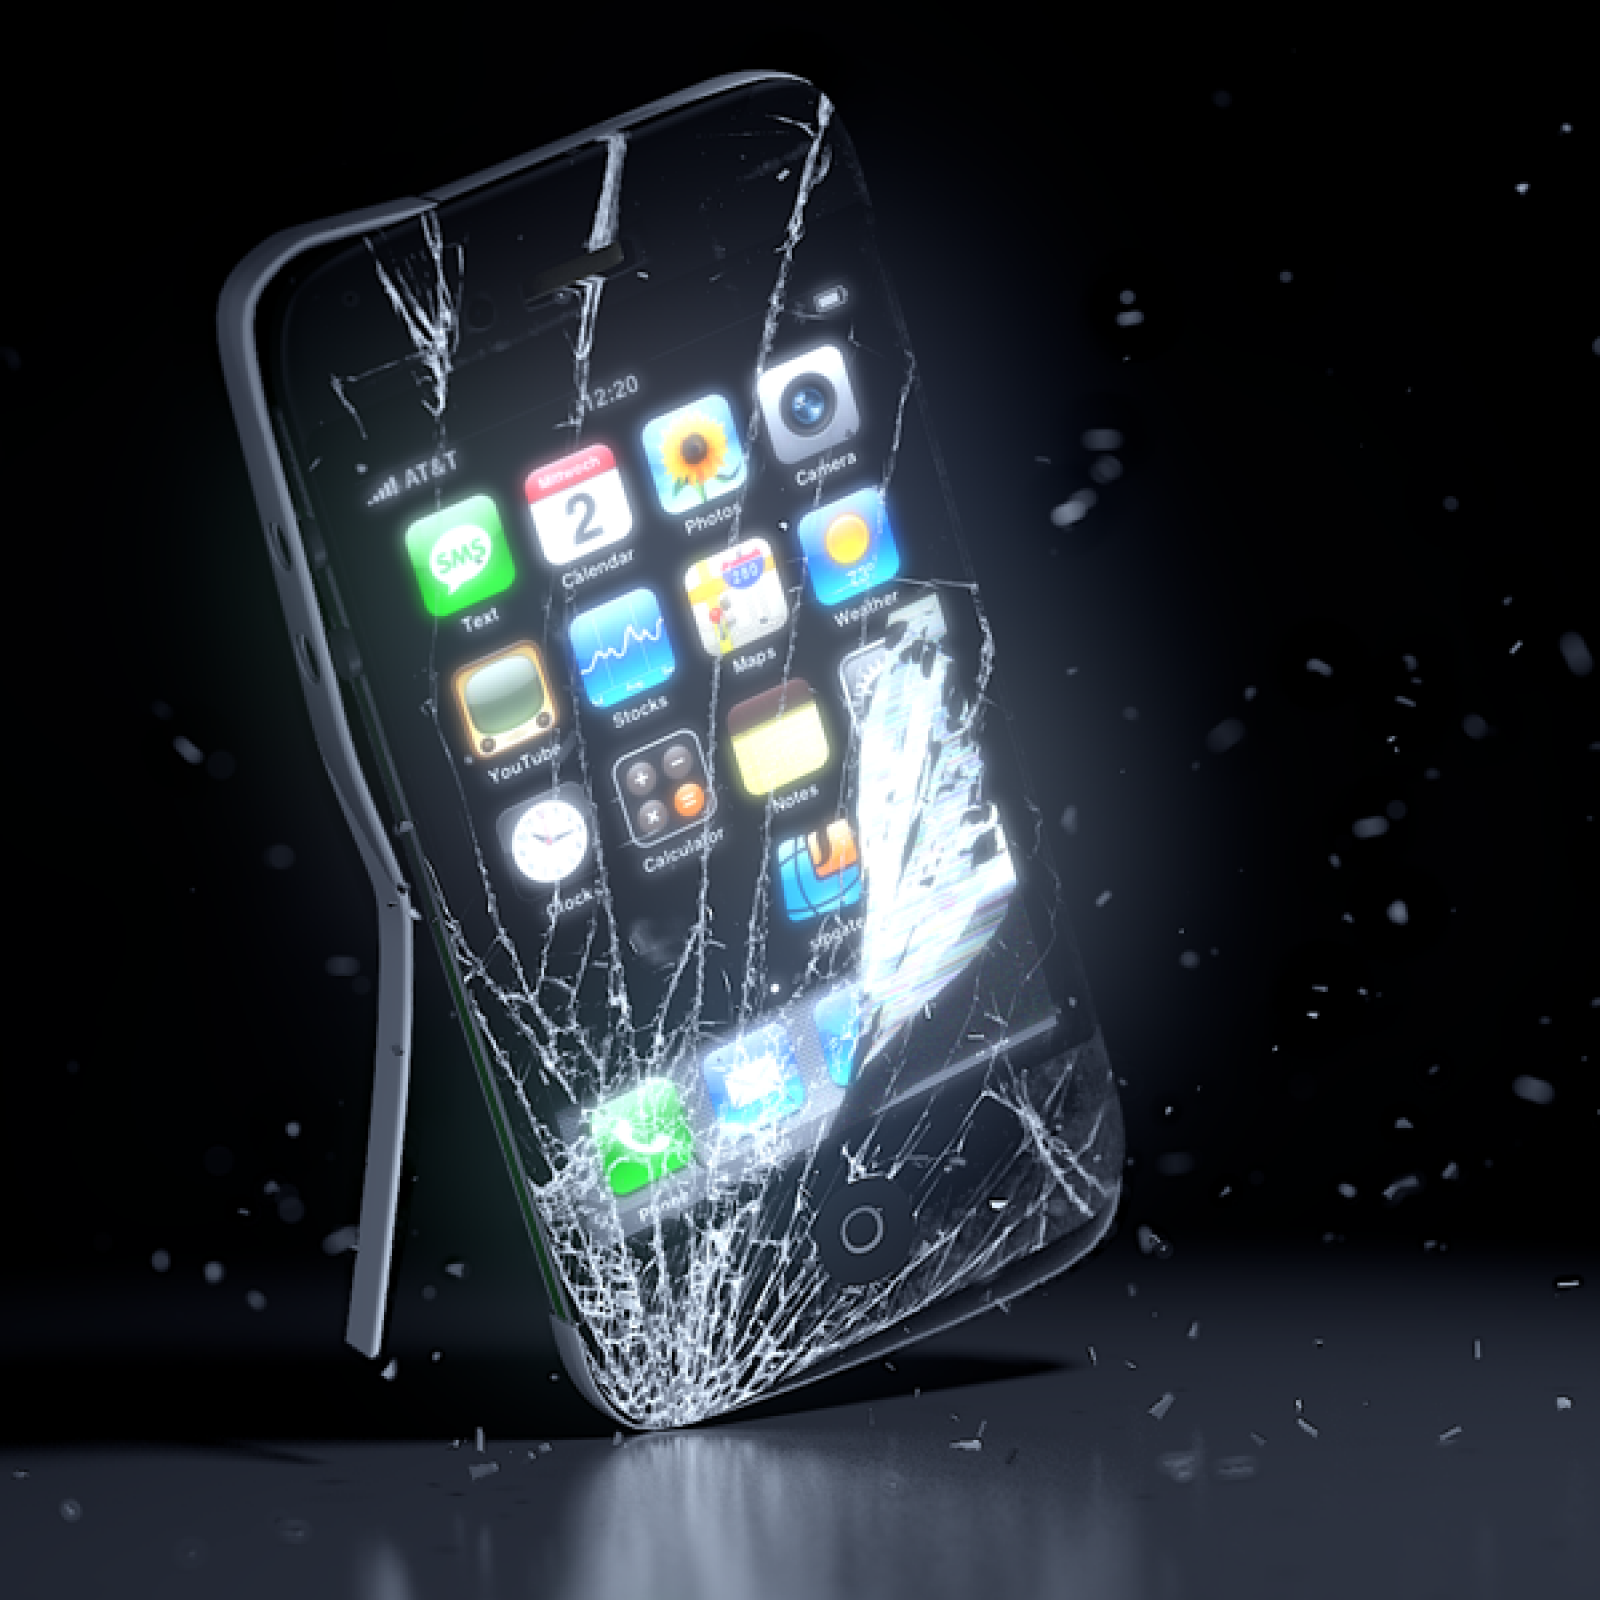 Prank Website Crashes iPhones by Overloading Web Browser